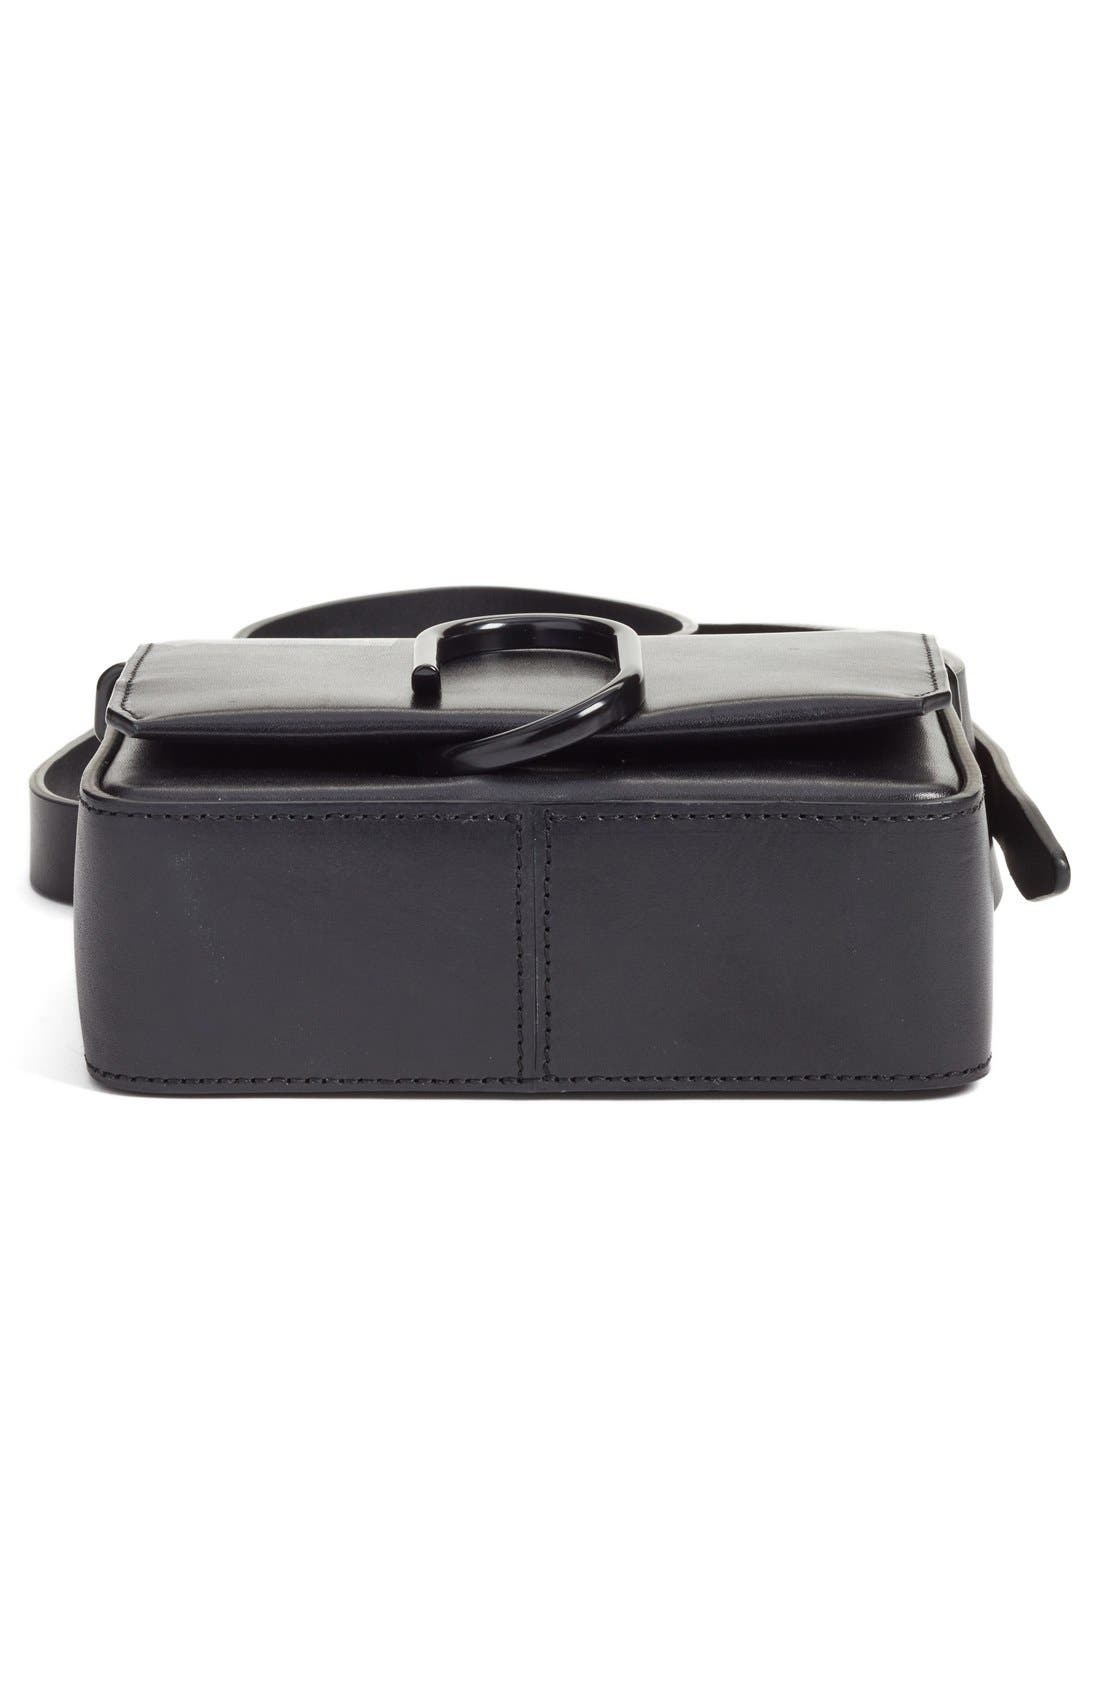 'Mini Alix' Leather Shoulder Bag,                             Alternate thumbnail 6, color,                             Black